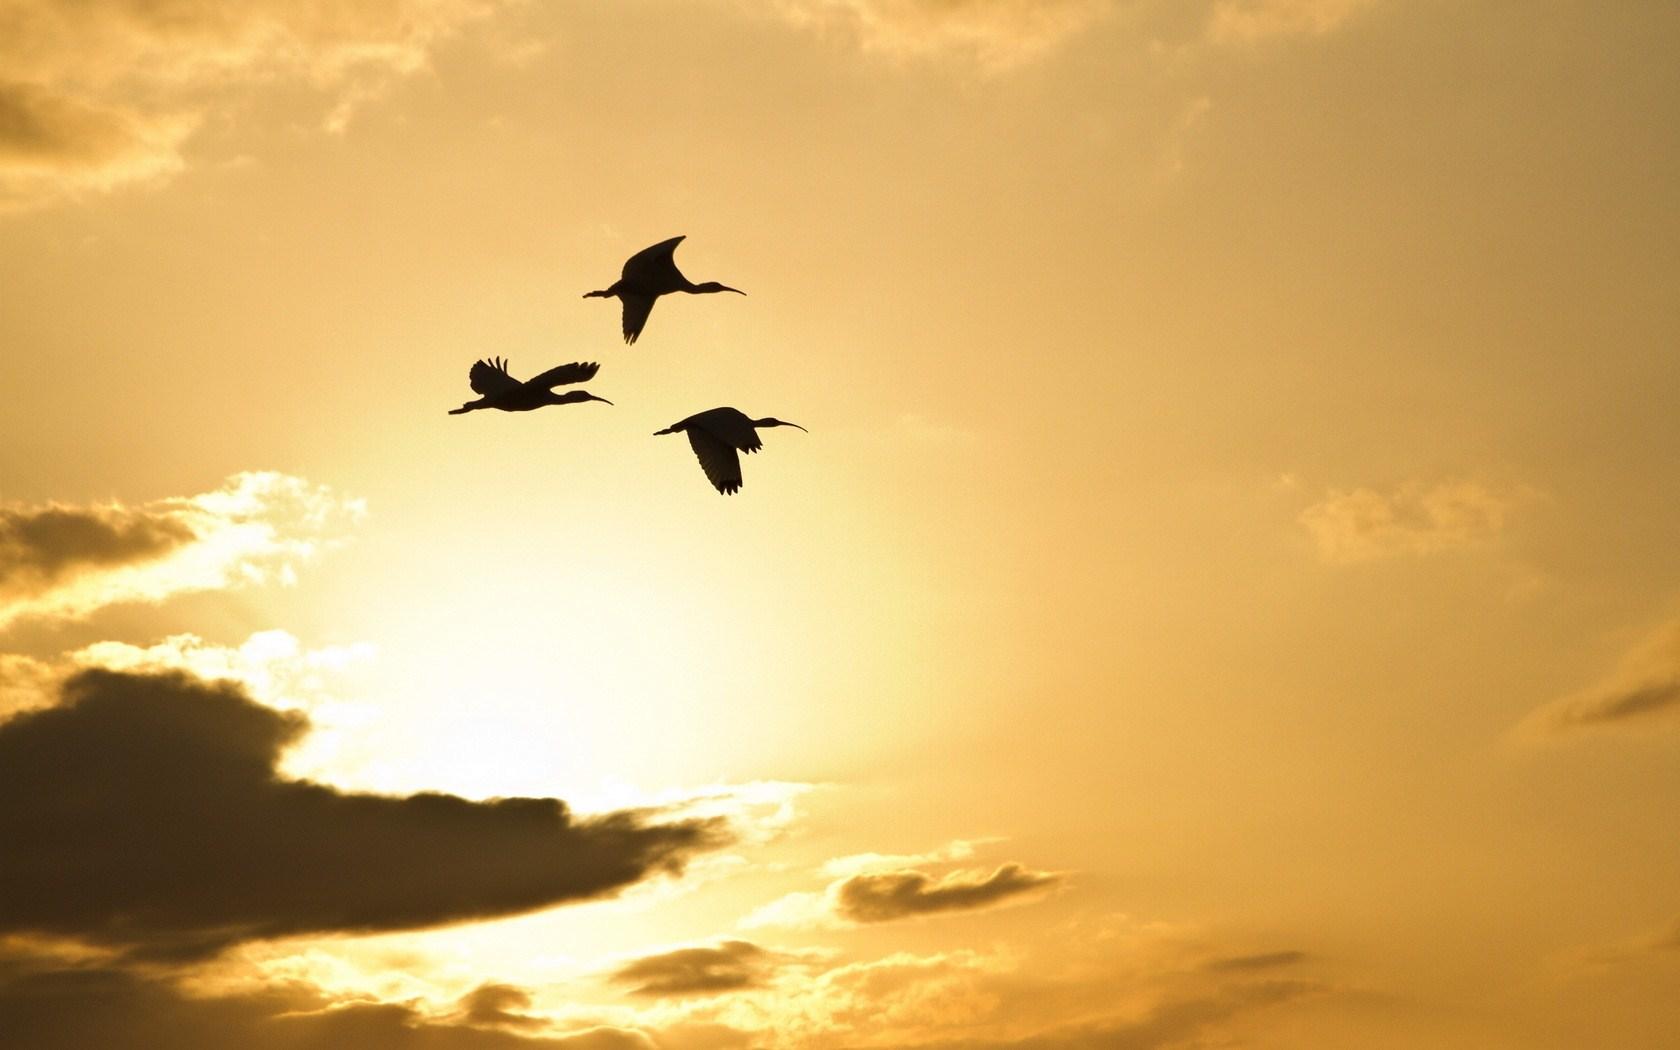 Sky Clouds Birds Storks